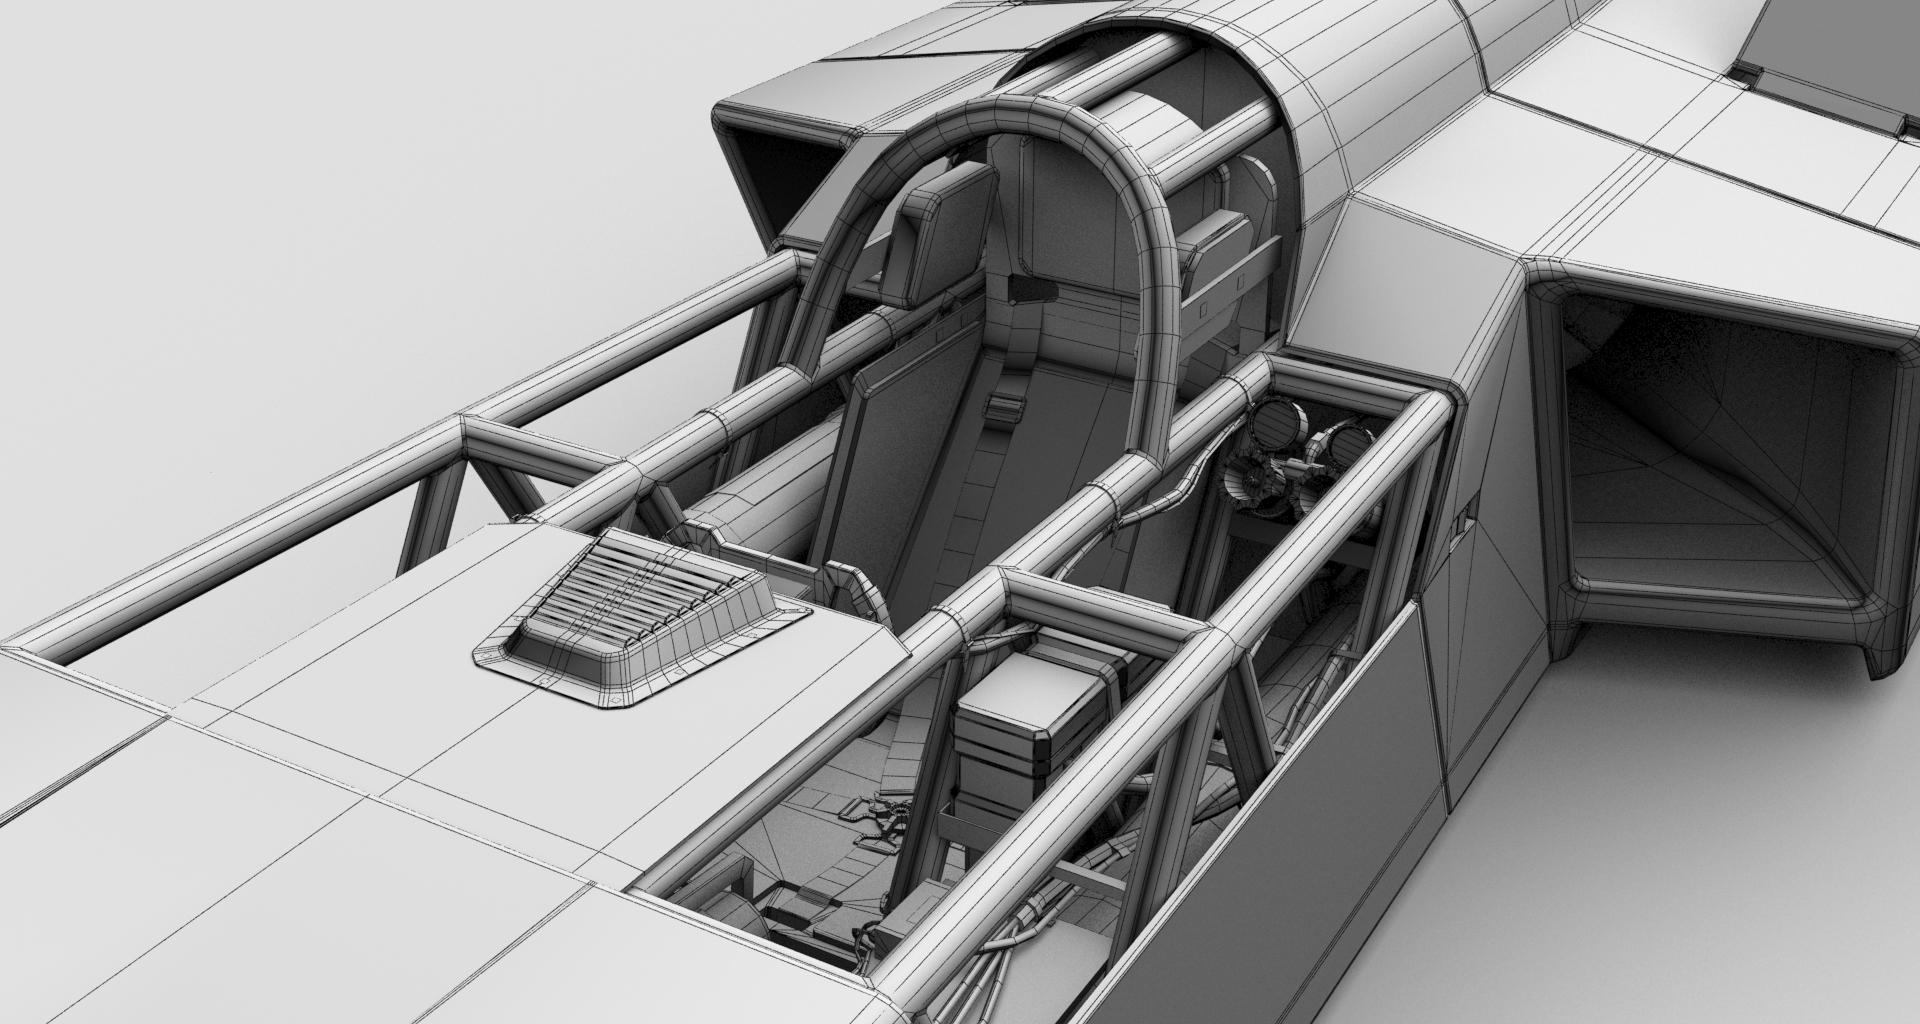 2012-10_The Crew_F.Beudin_Rocket-Car_AO_Cockpit_02